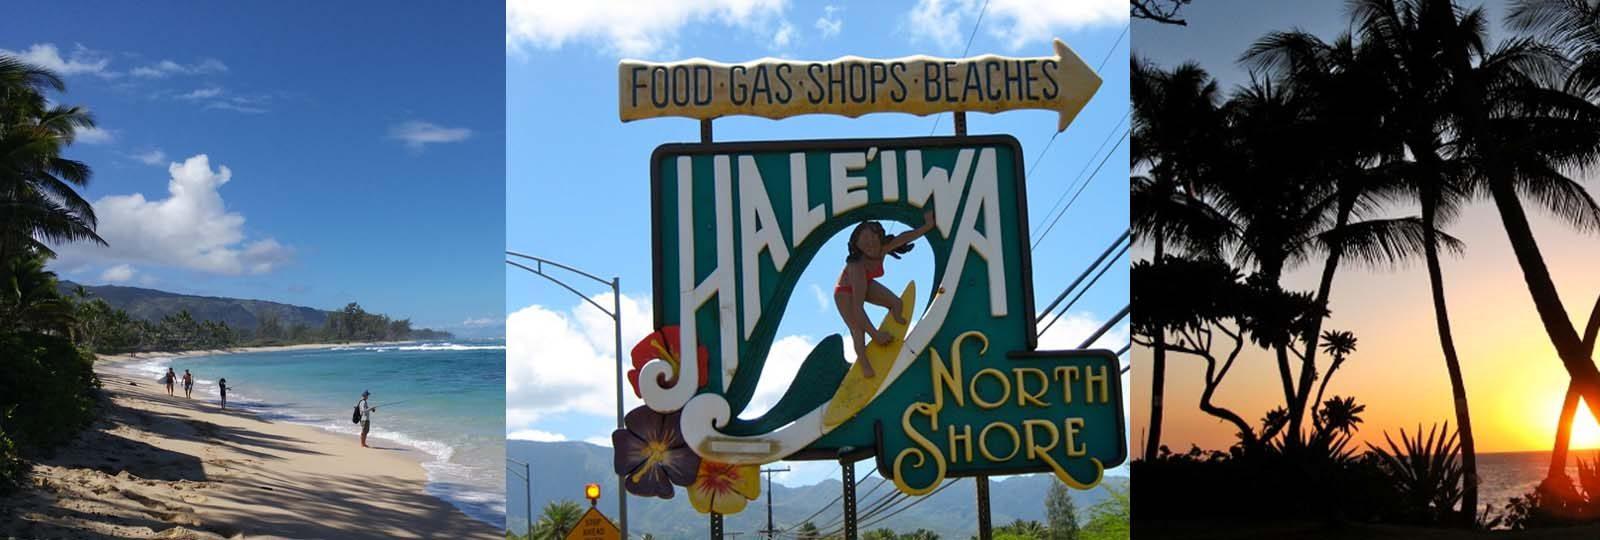 Hawaii Surf Camps - Endless Summer Surf Camp